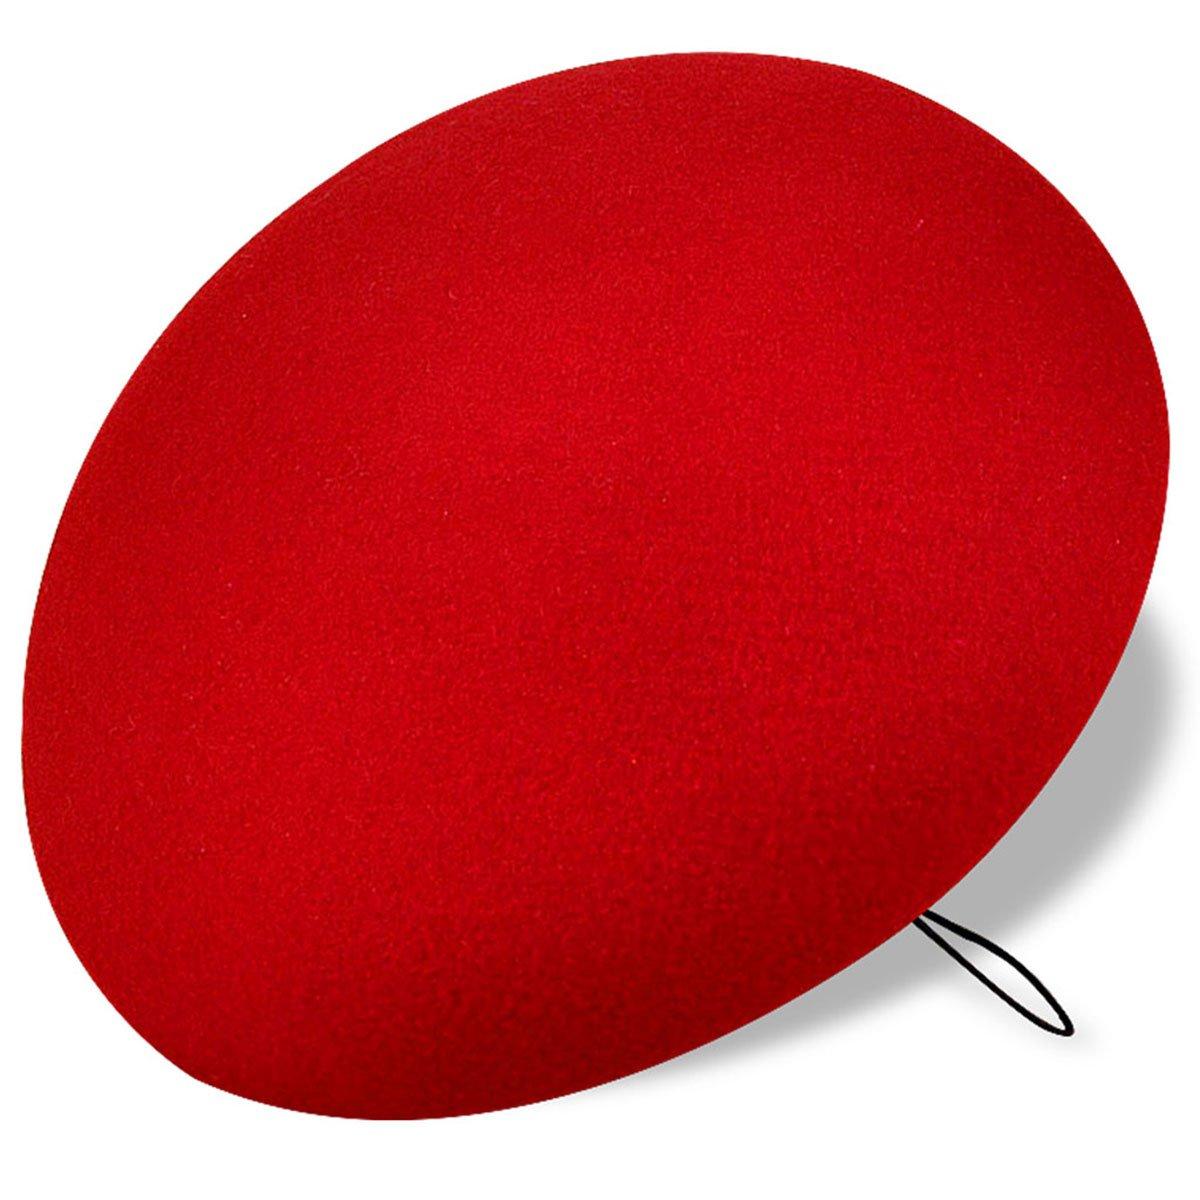 Lawliet Elegant Solid Circle 6.69 Wool Felt Fascinator Base Millinery Craft Fashion Pillbox Hat A048Black